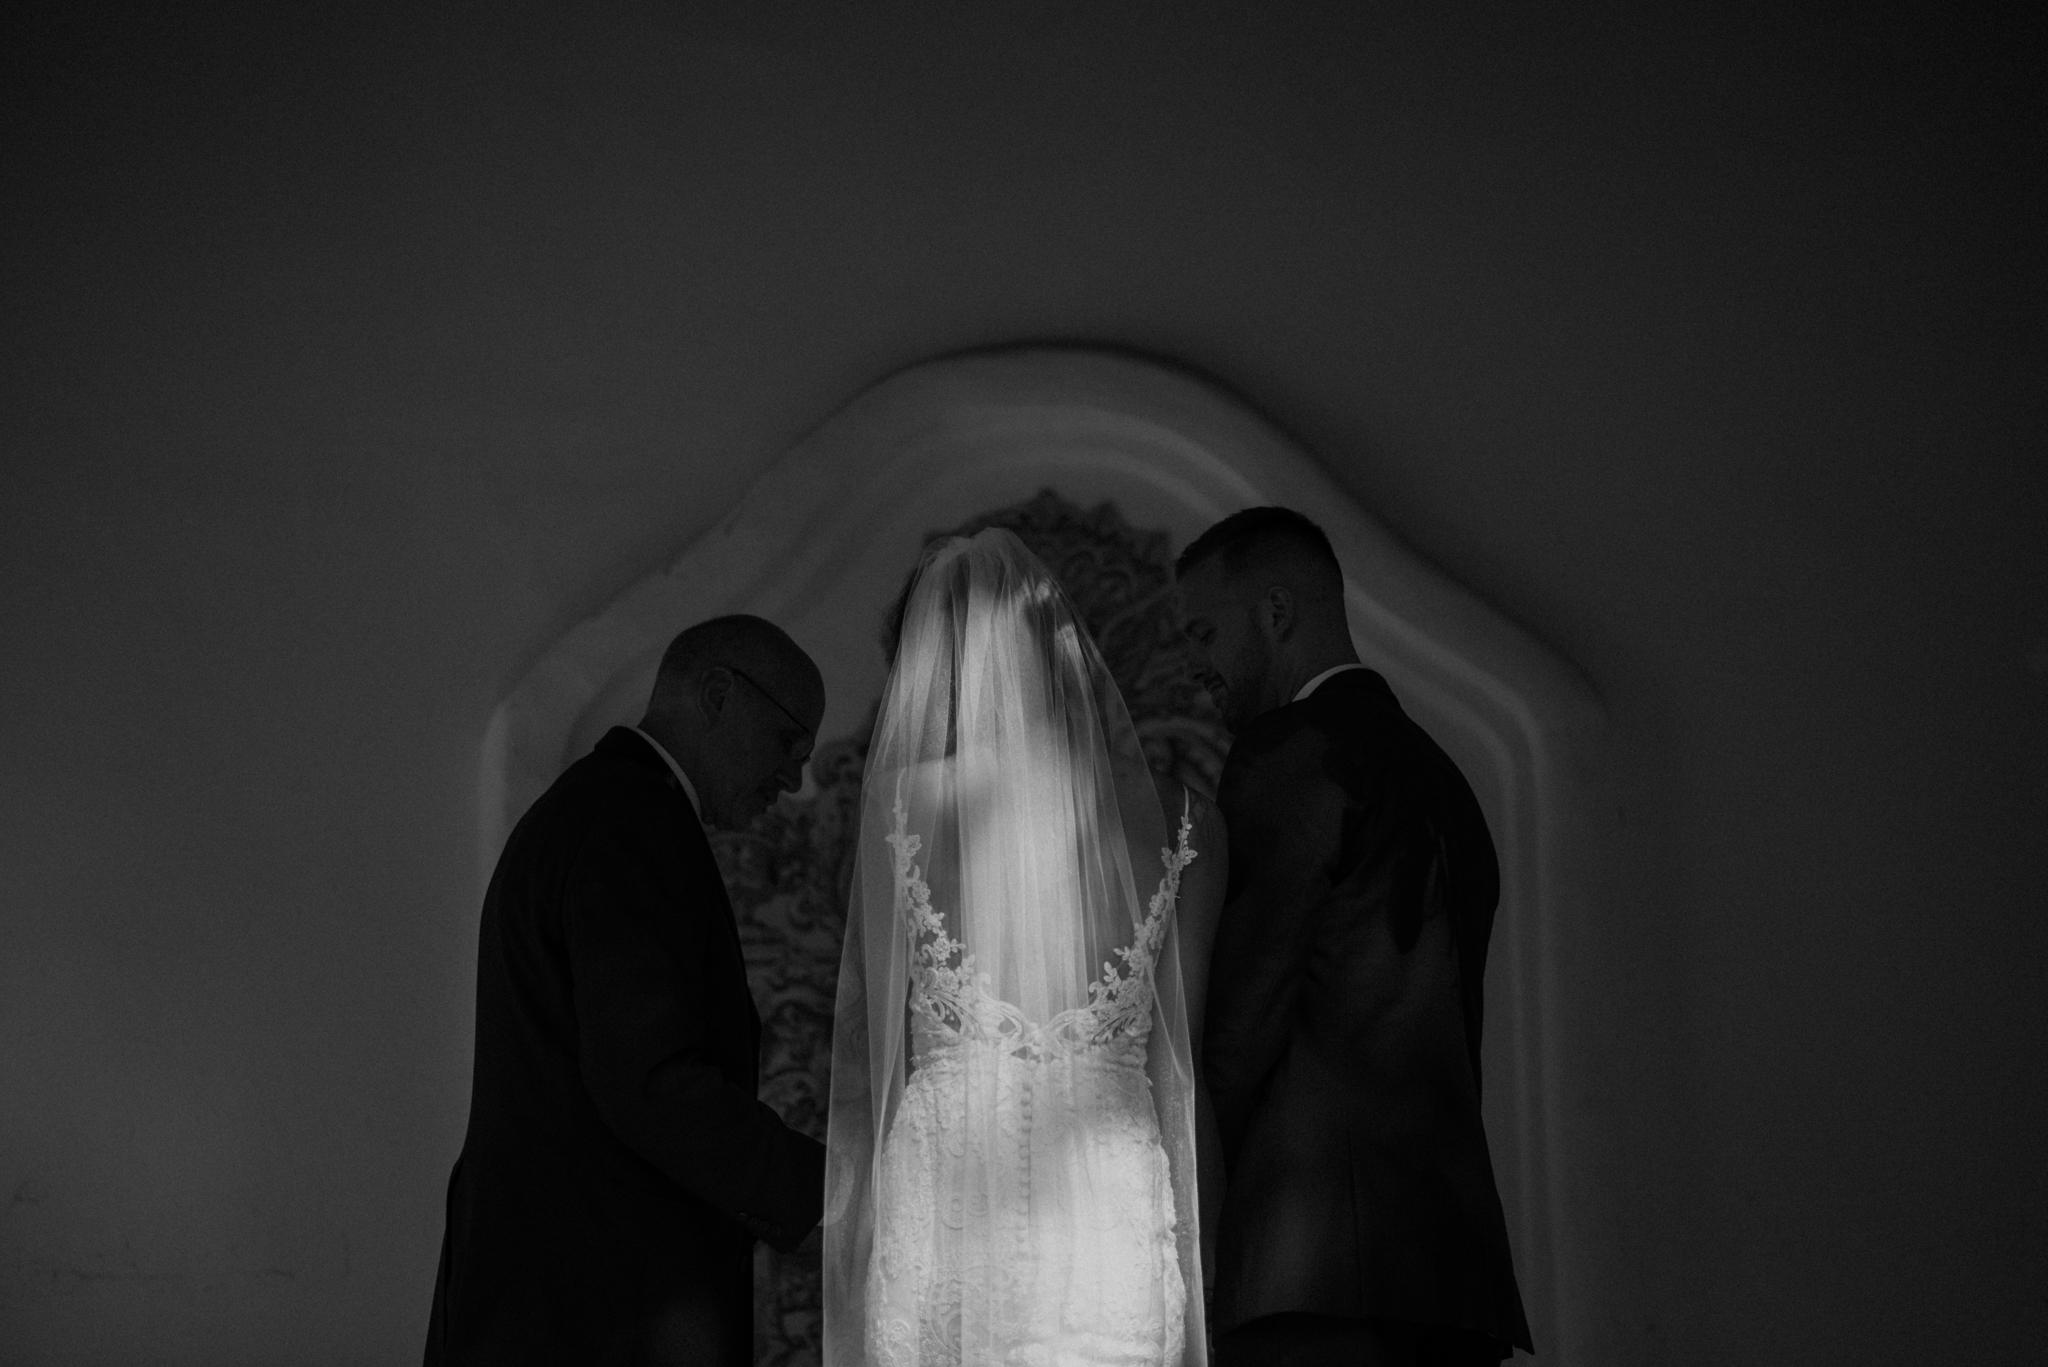 Isaiah + Taylor Photography - Rancho Las Lomas Wedding, Los Angeles Wedding Photographer-062.jpg